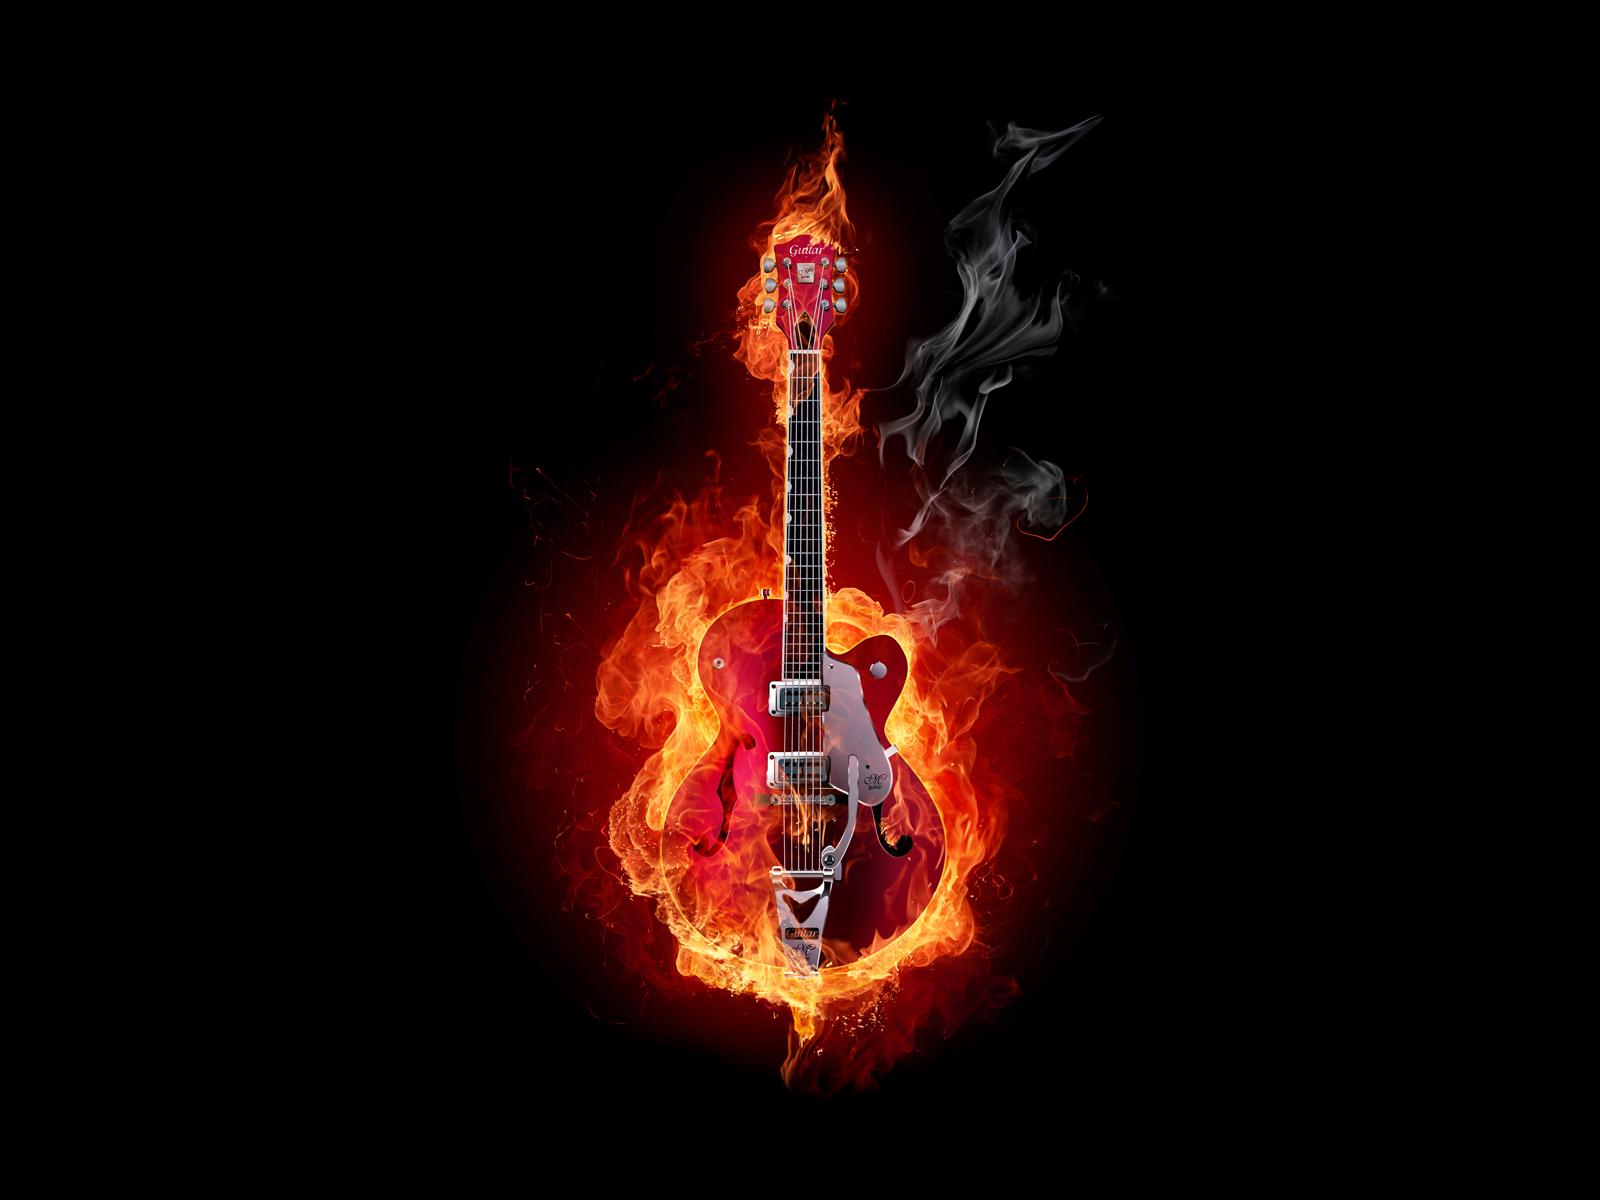 free wallpicz guitar desktop wallpaper hd